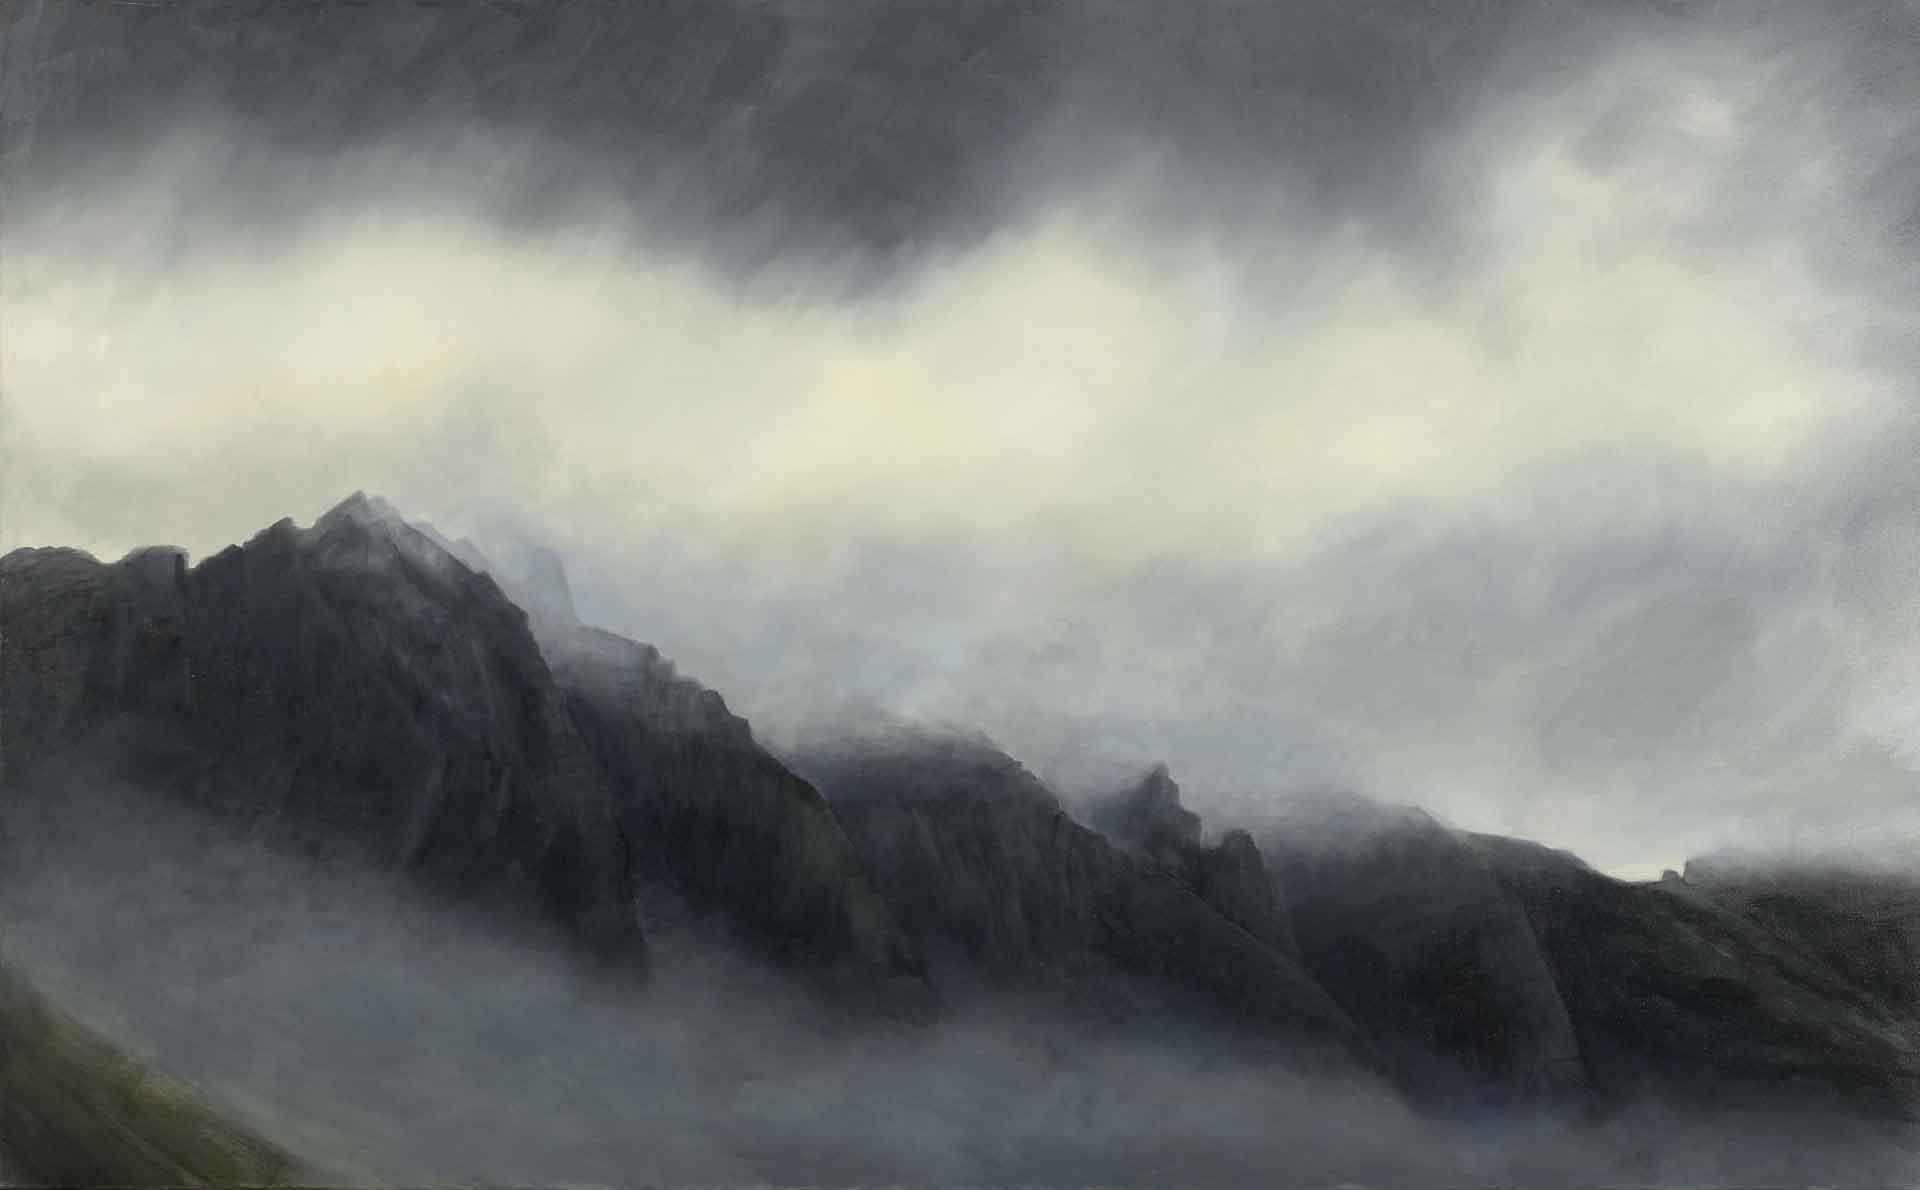 Misty peaks Of Glencoe - Landscape Painting by Victoria Orr Ewing